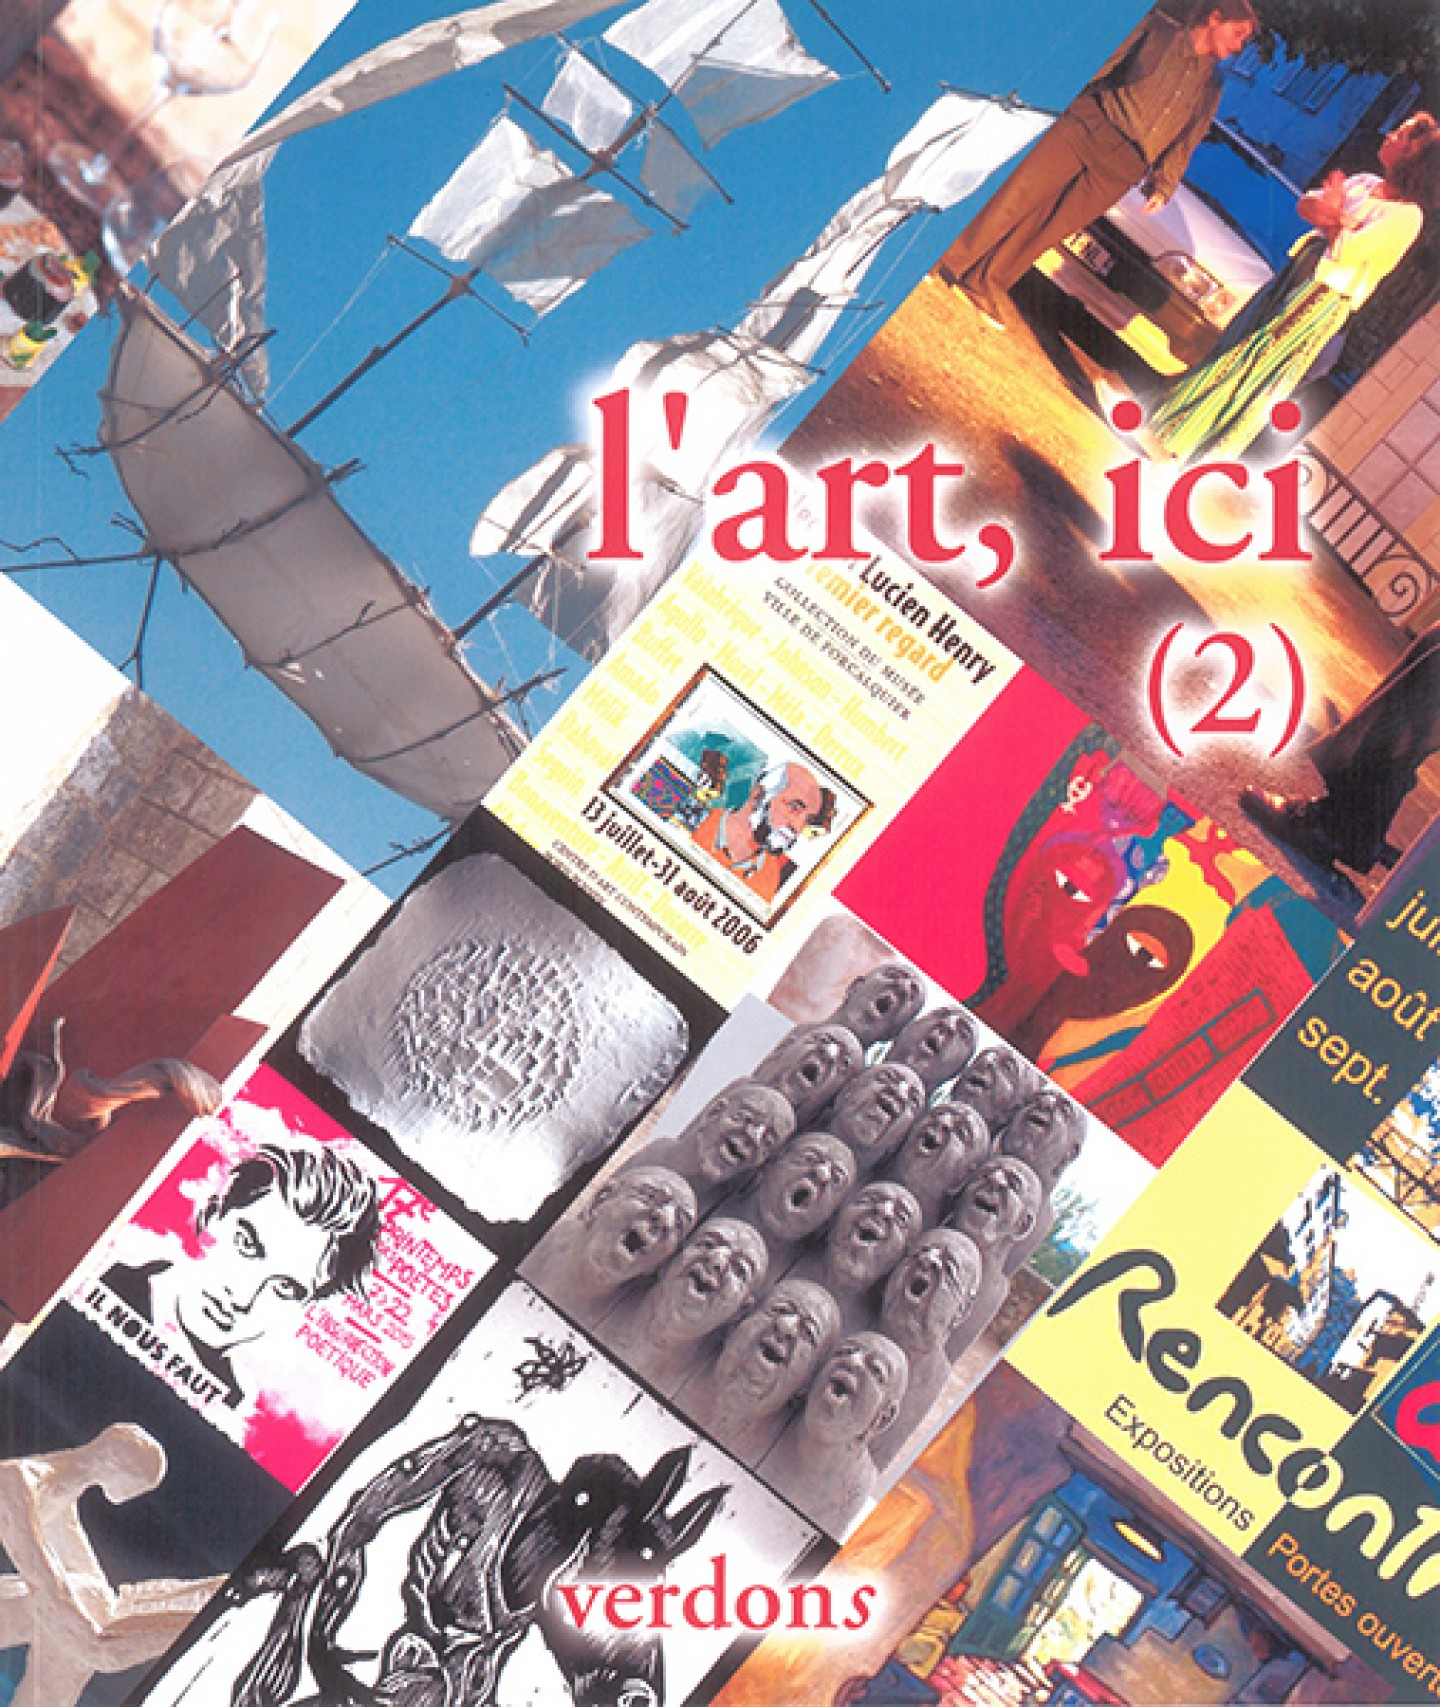 Revue verdons n°60 l'art, ici (2)